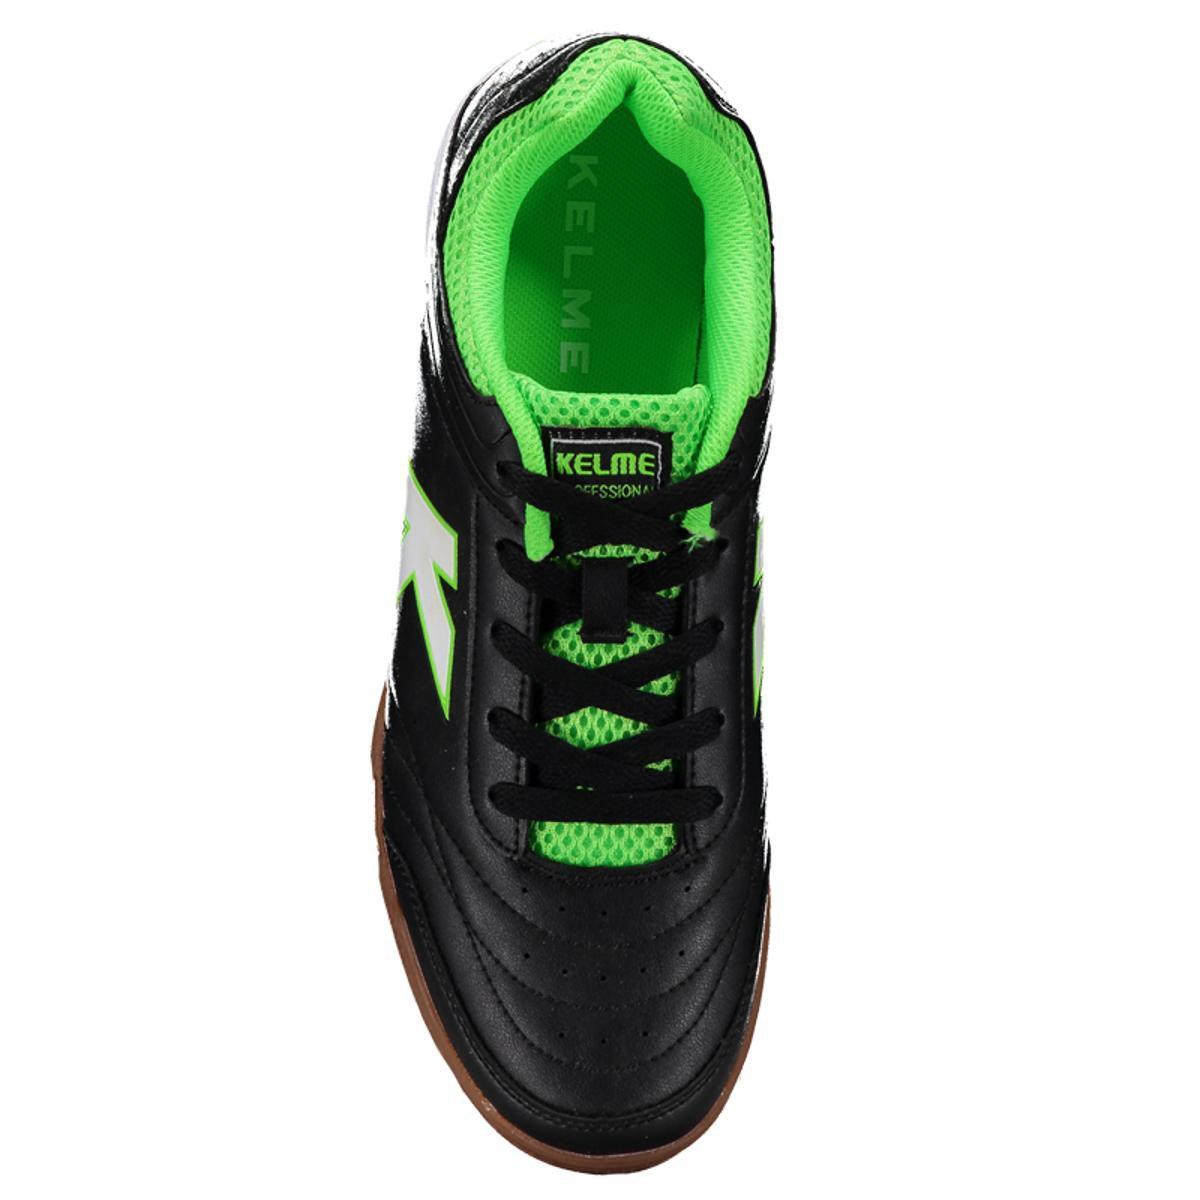 Chuteira Kelme Precision Trn Futsal - Preto - Compre Agora  afefdded40637